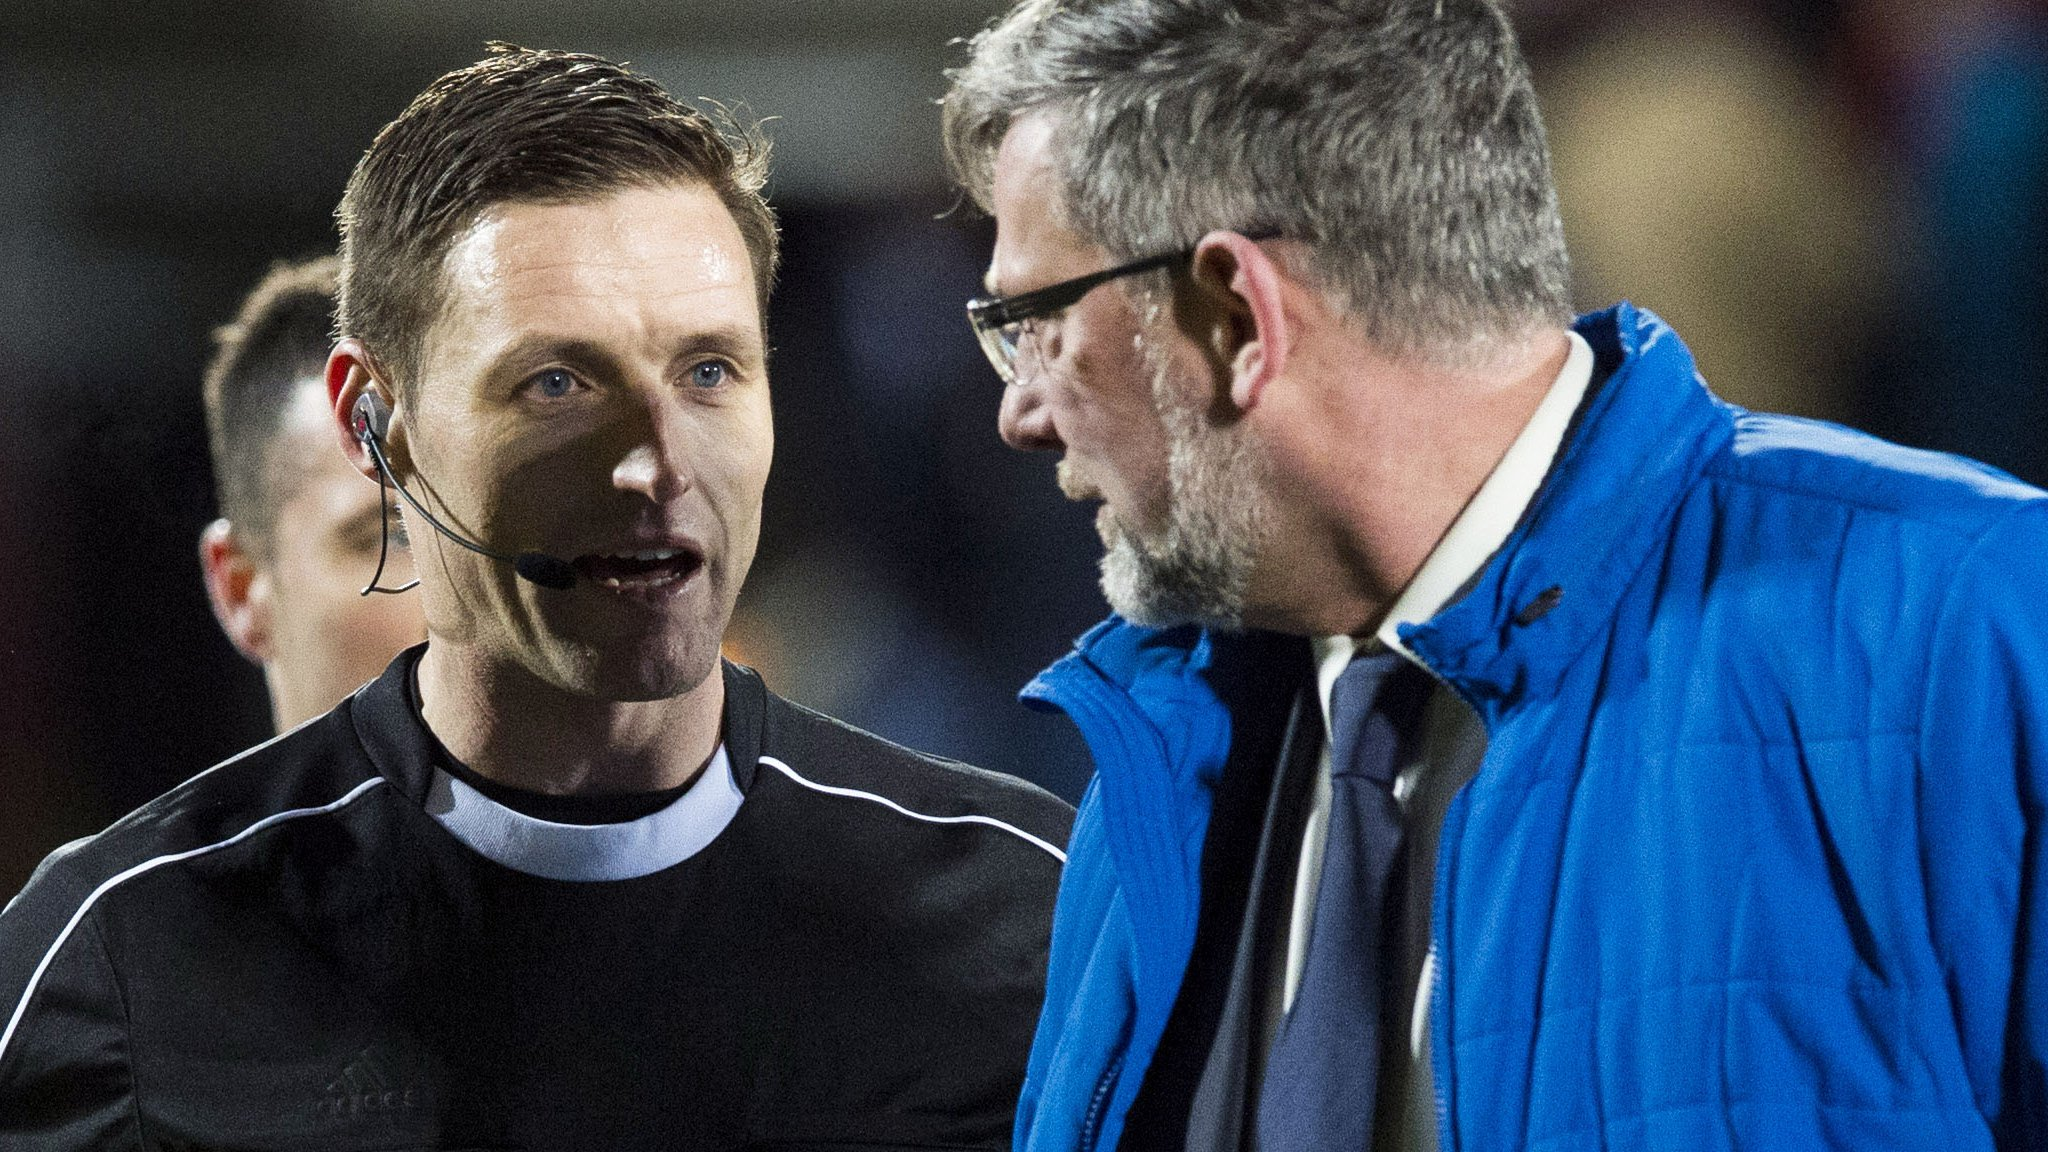 Hearts' Craig Levein backs VAR ahead of salaried referees